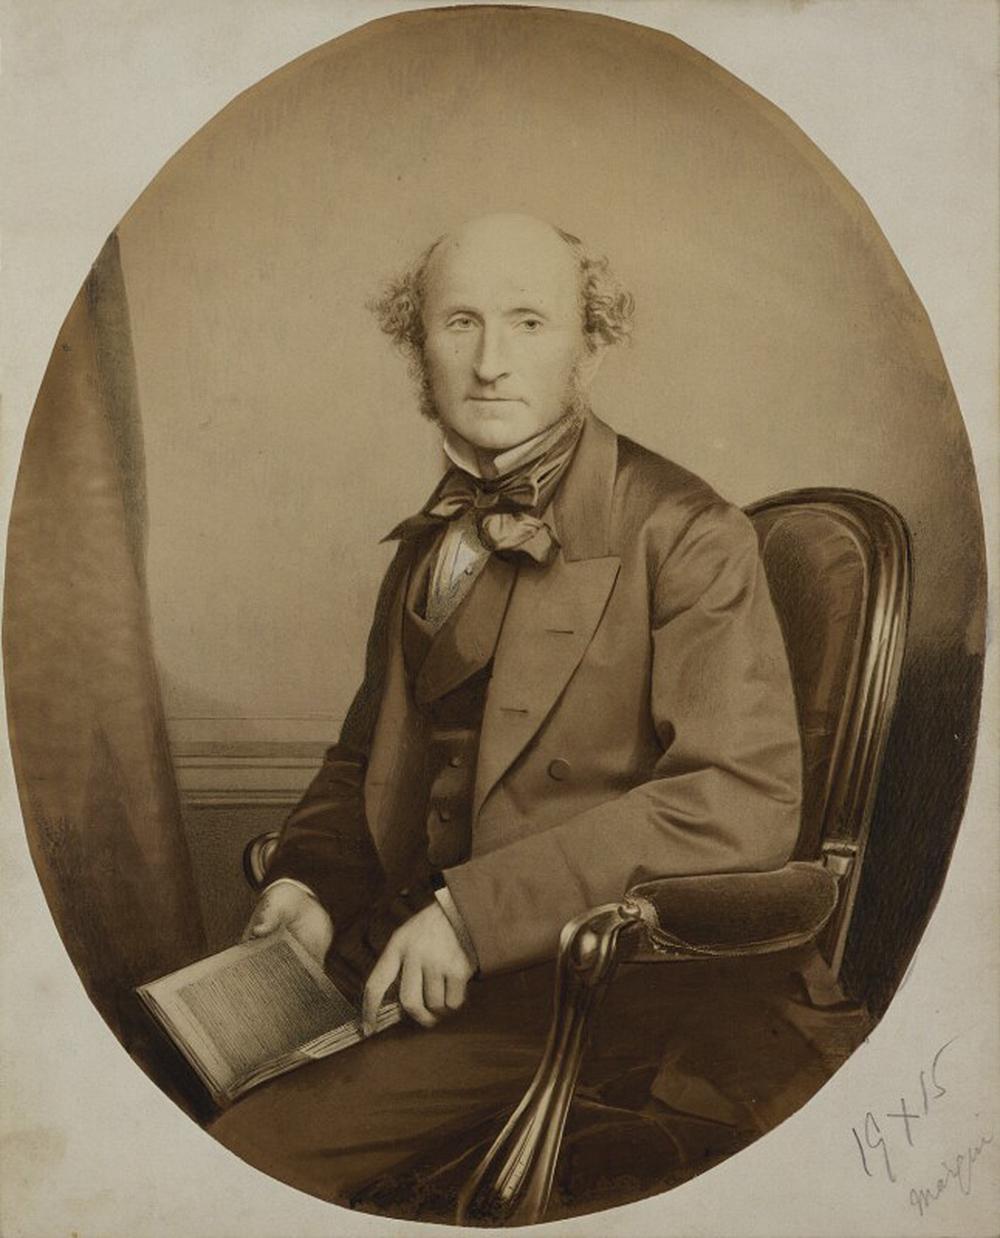 John Stuart Mill, by John & Charles Watkins, 1865. National Portrait Gallery.